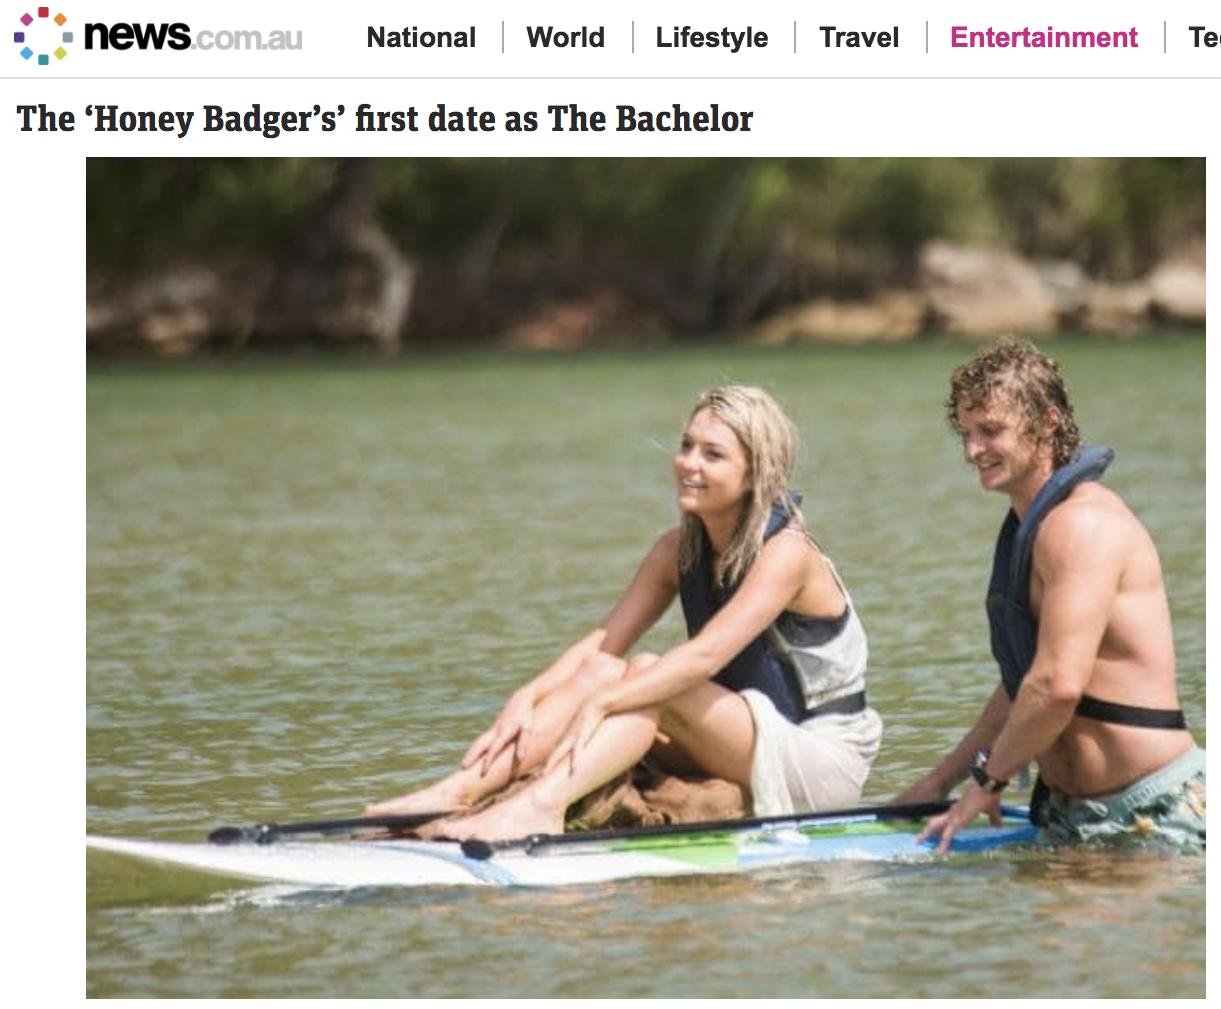 The Bachelor paparrazi photo (news.com.au) [1]